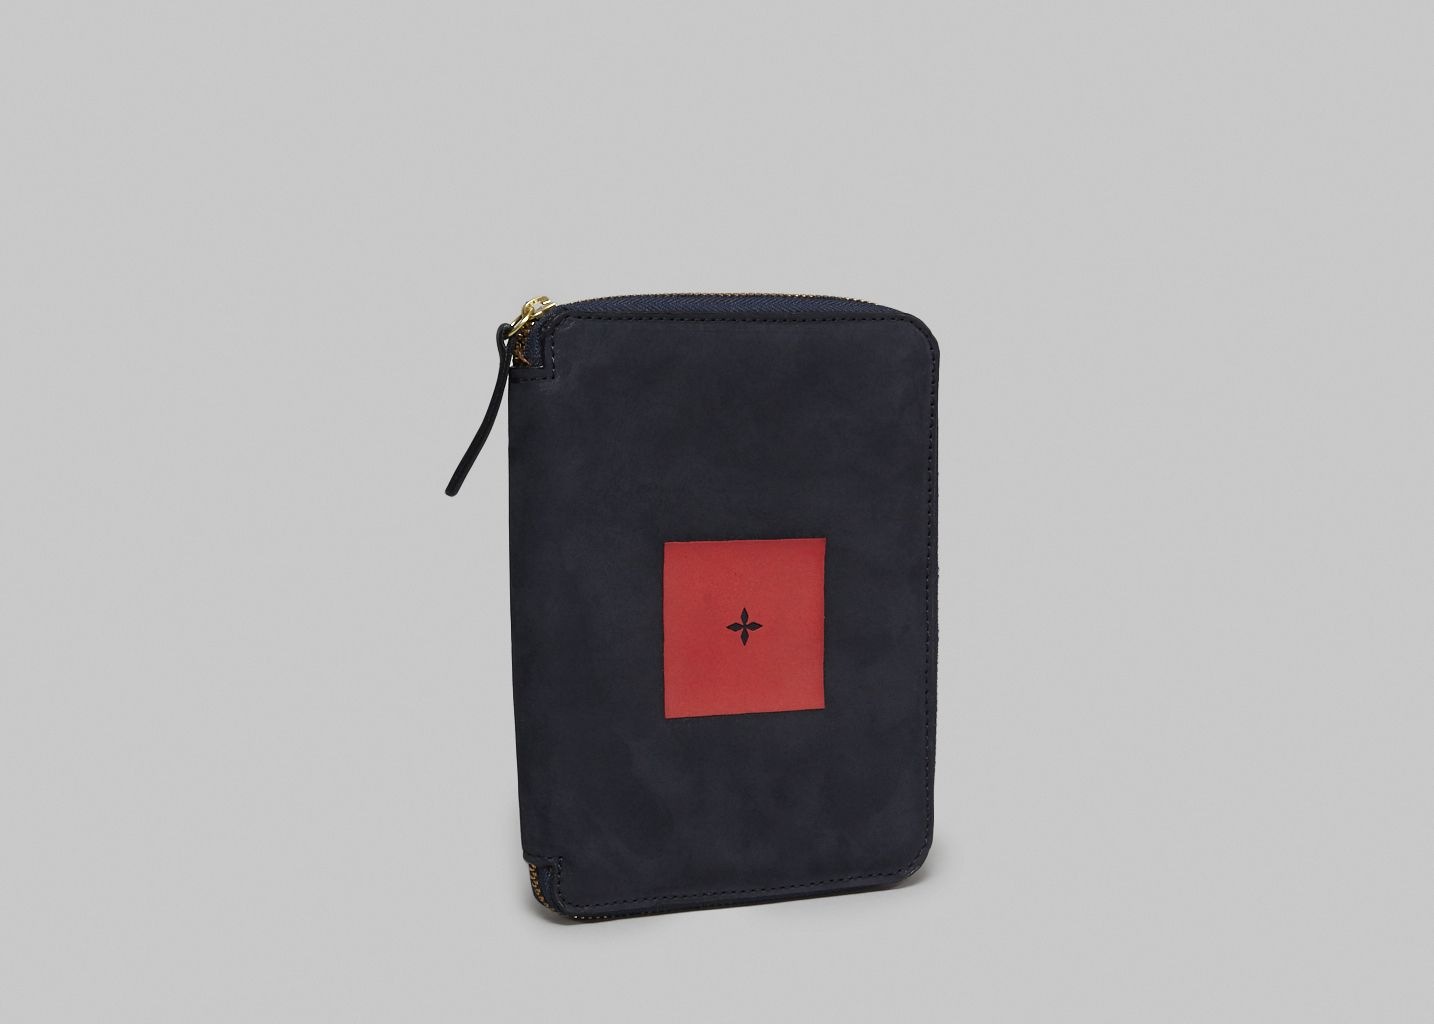 Notebook 15 Mai  - Commune de Paris